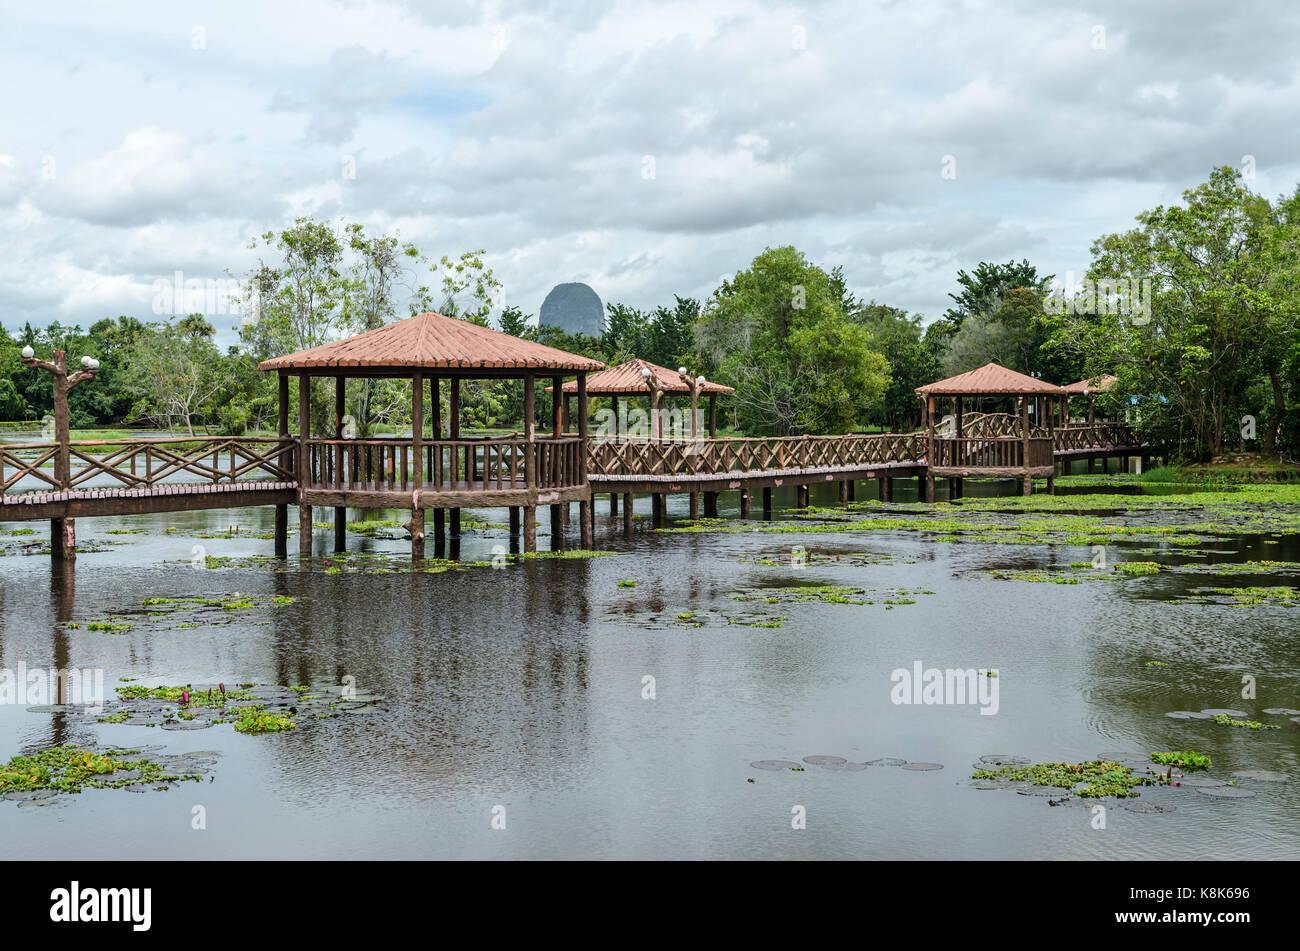 Taman Rekreasi Tasik Melati, Perlis, Malaysia - Tasik Melati is a wetland with its wild plant Stock Photo